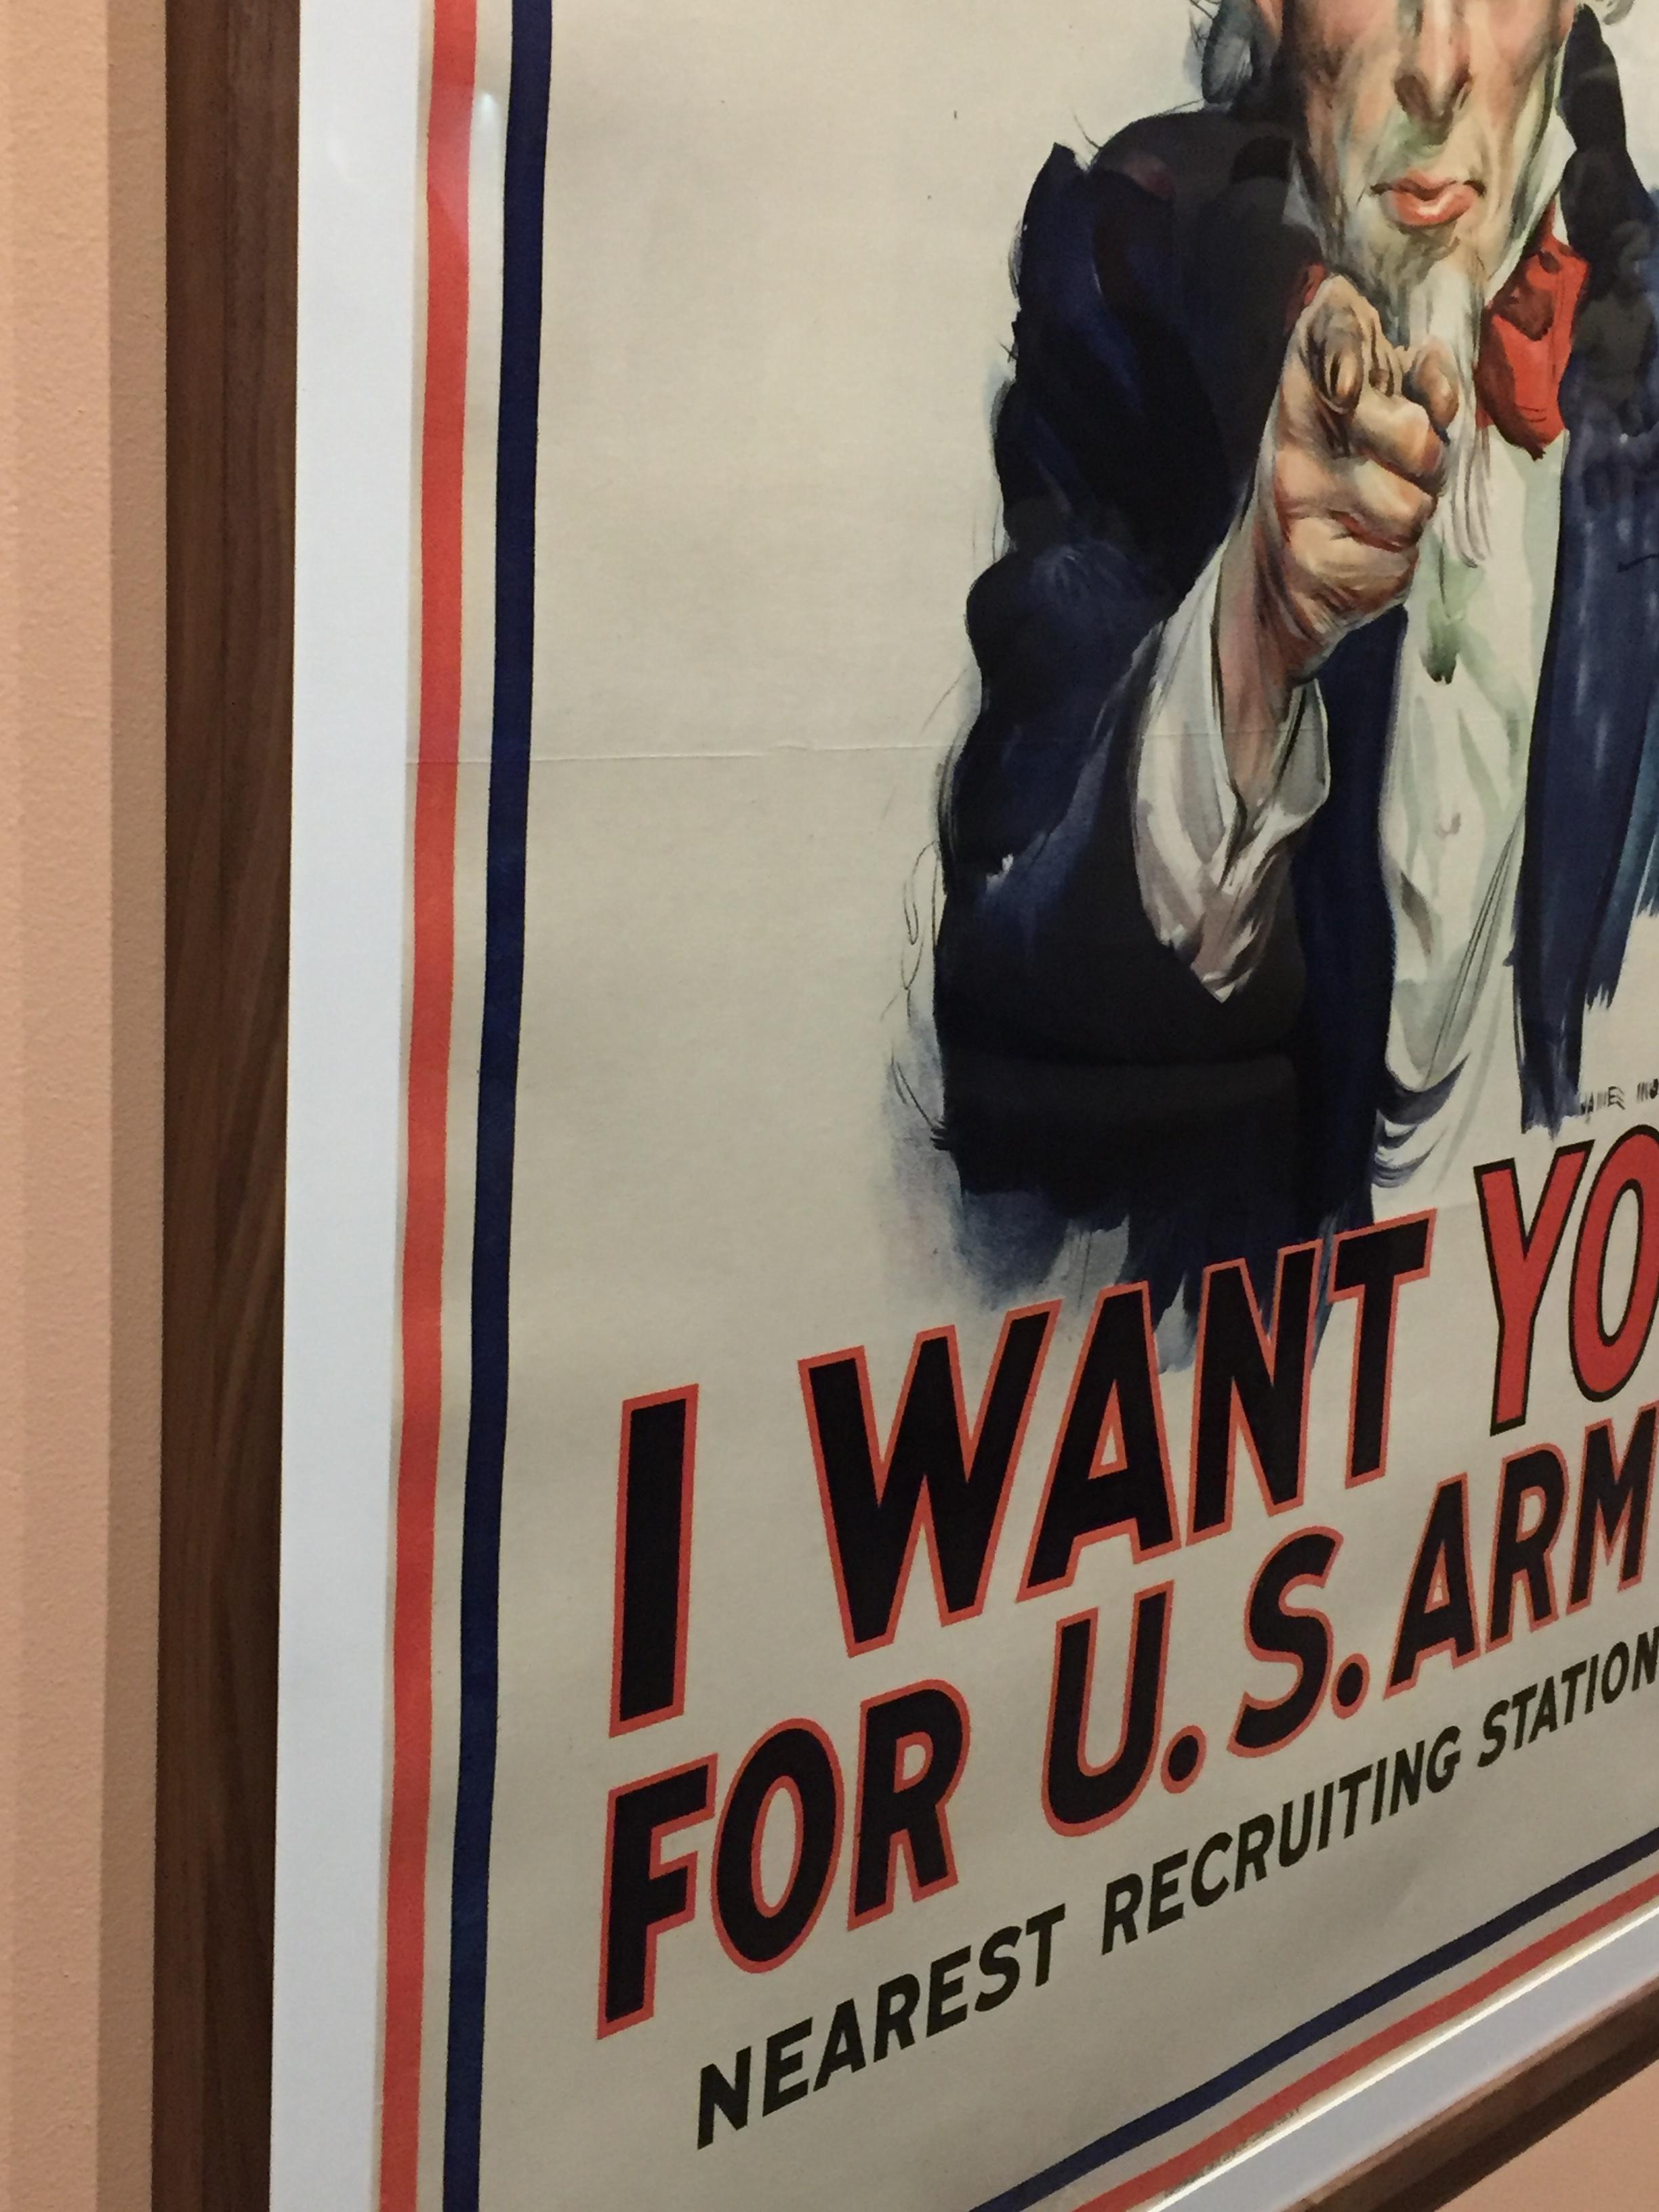 causes of war propaganda posters (3).JPG